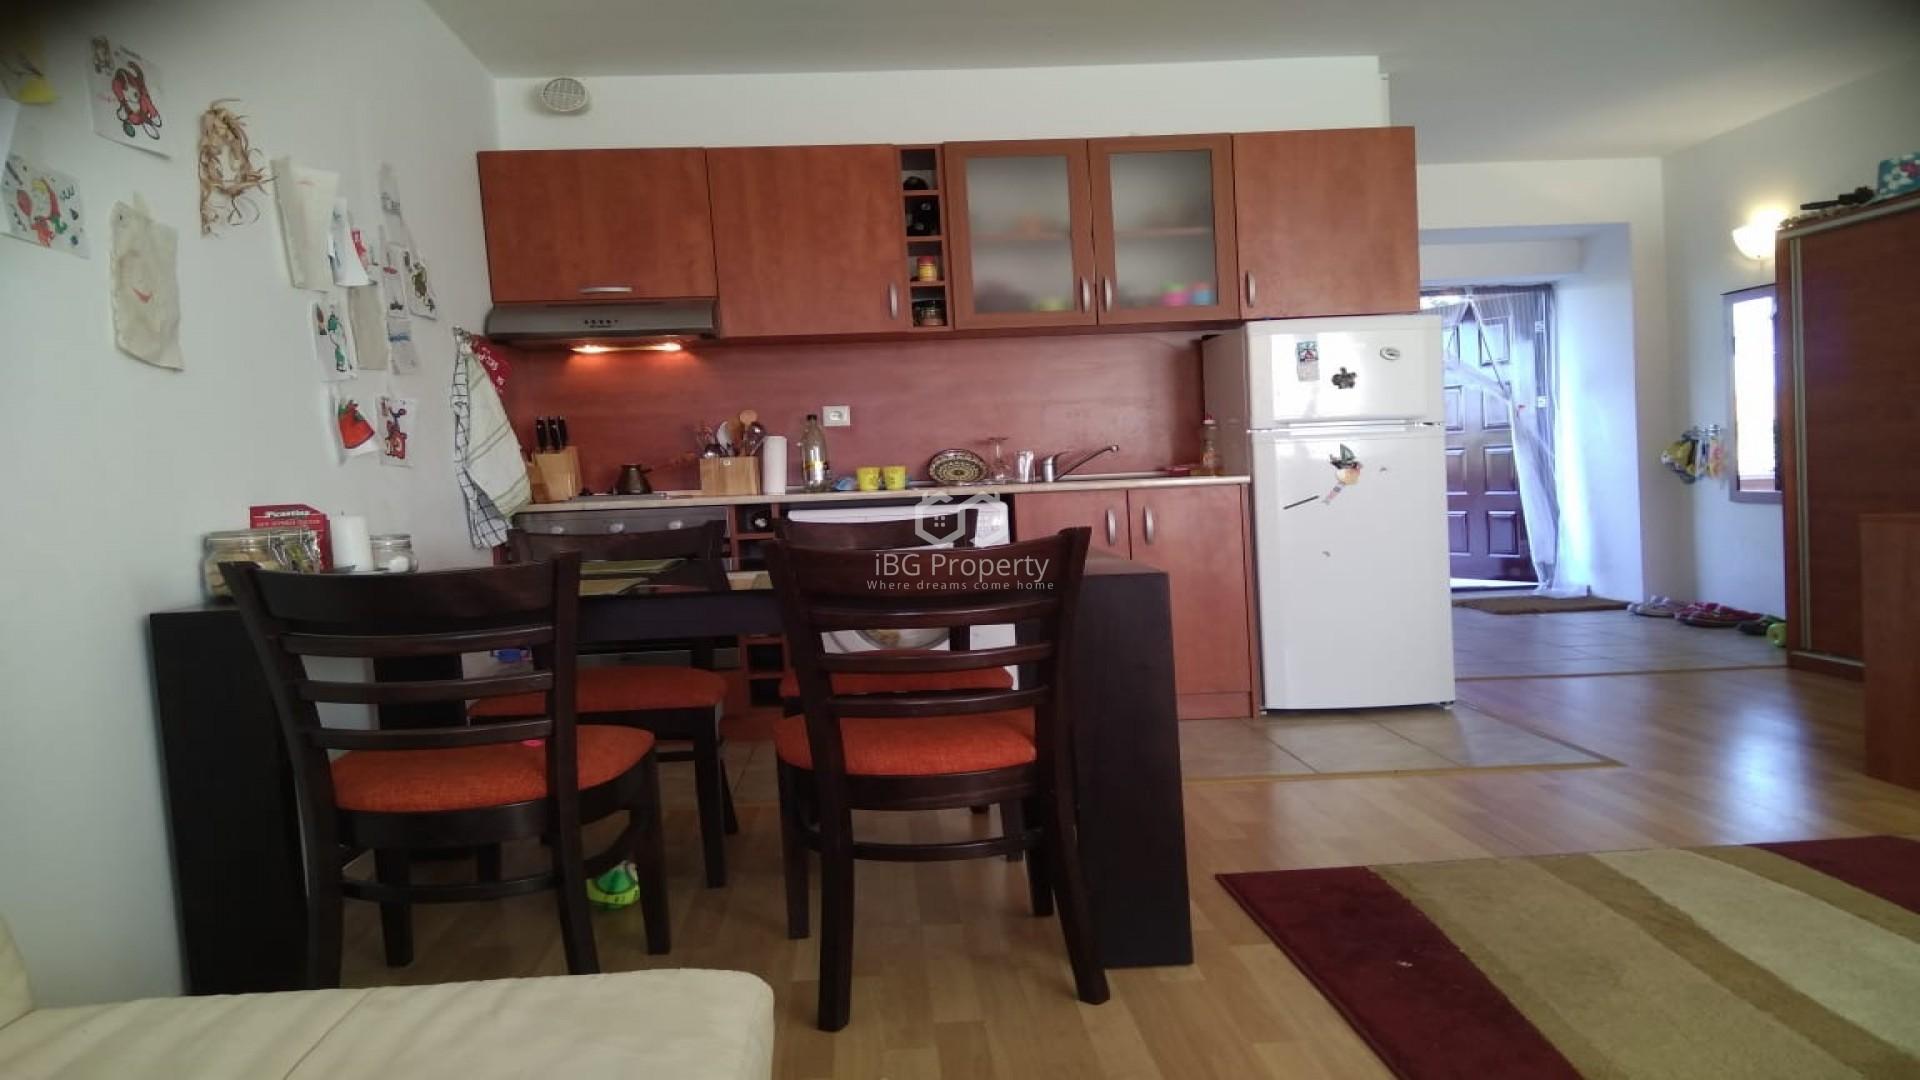 Однокомнатная квартира Бяла  52 m2